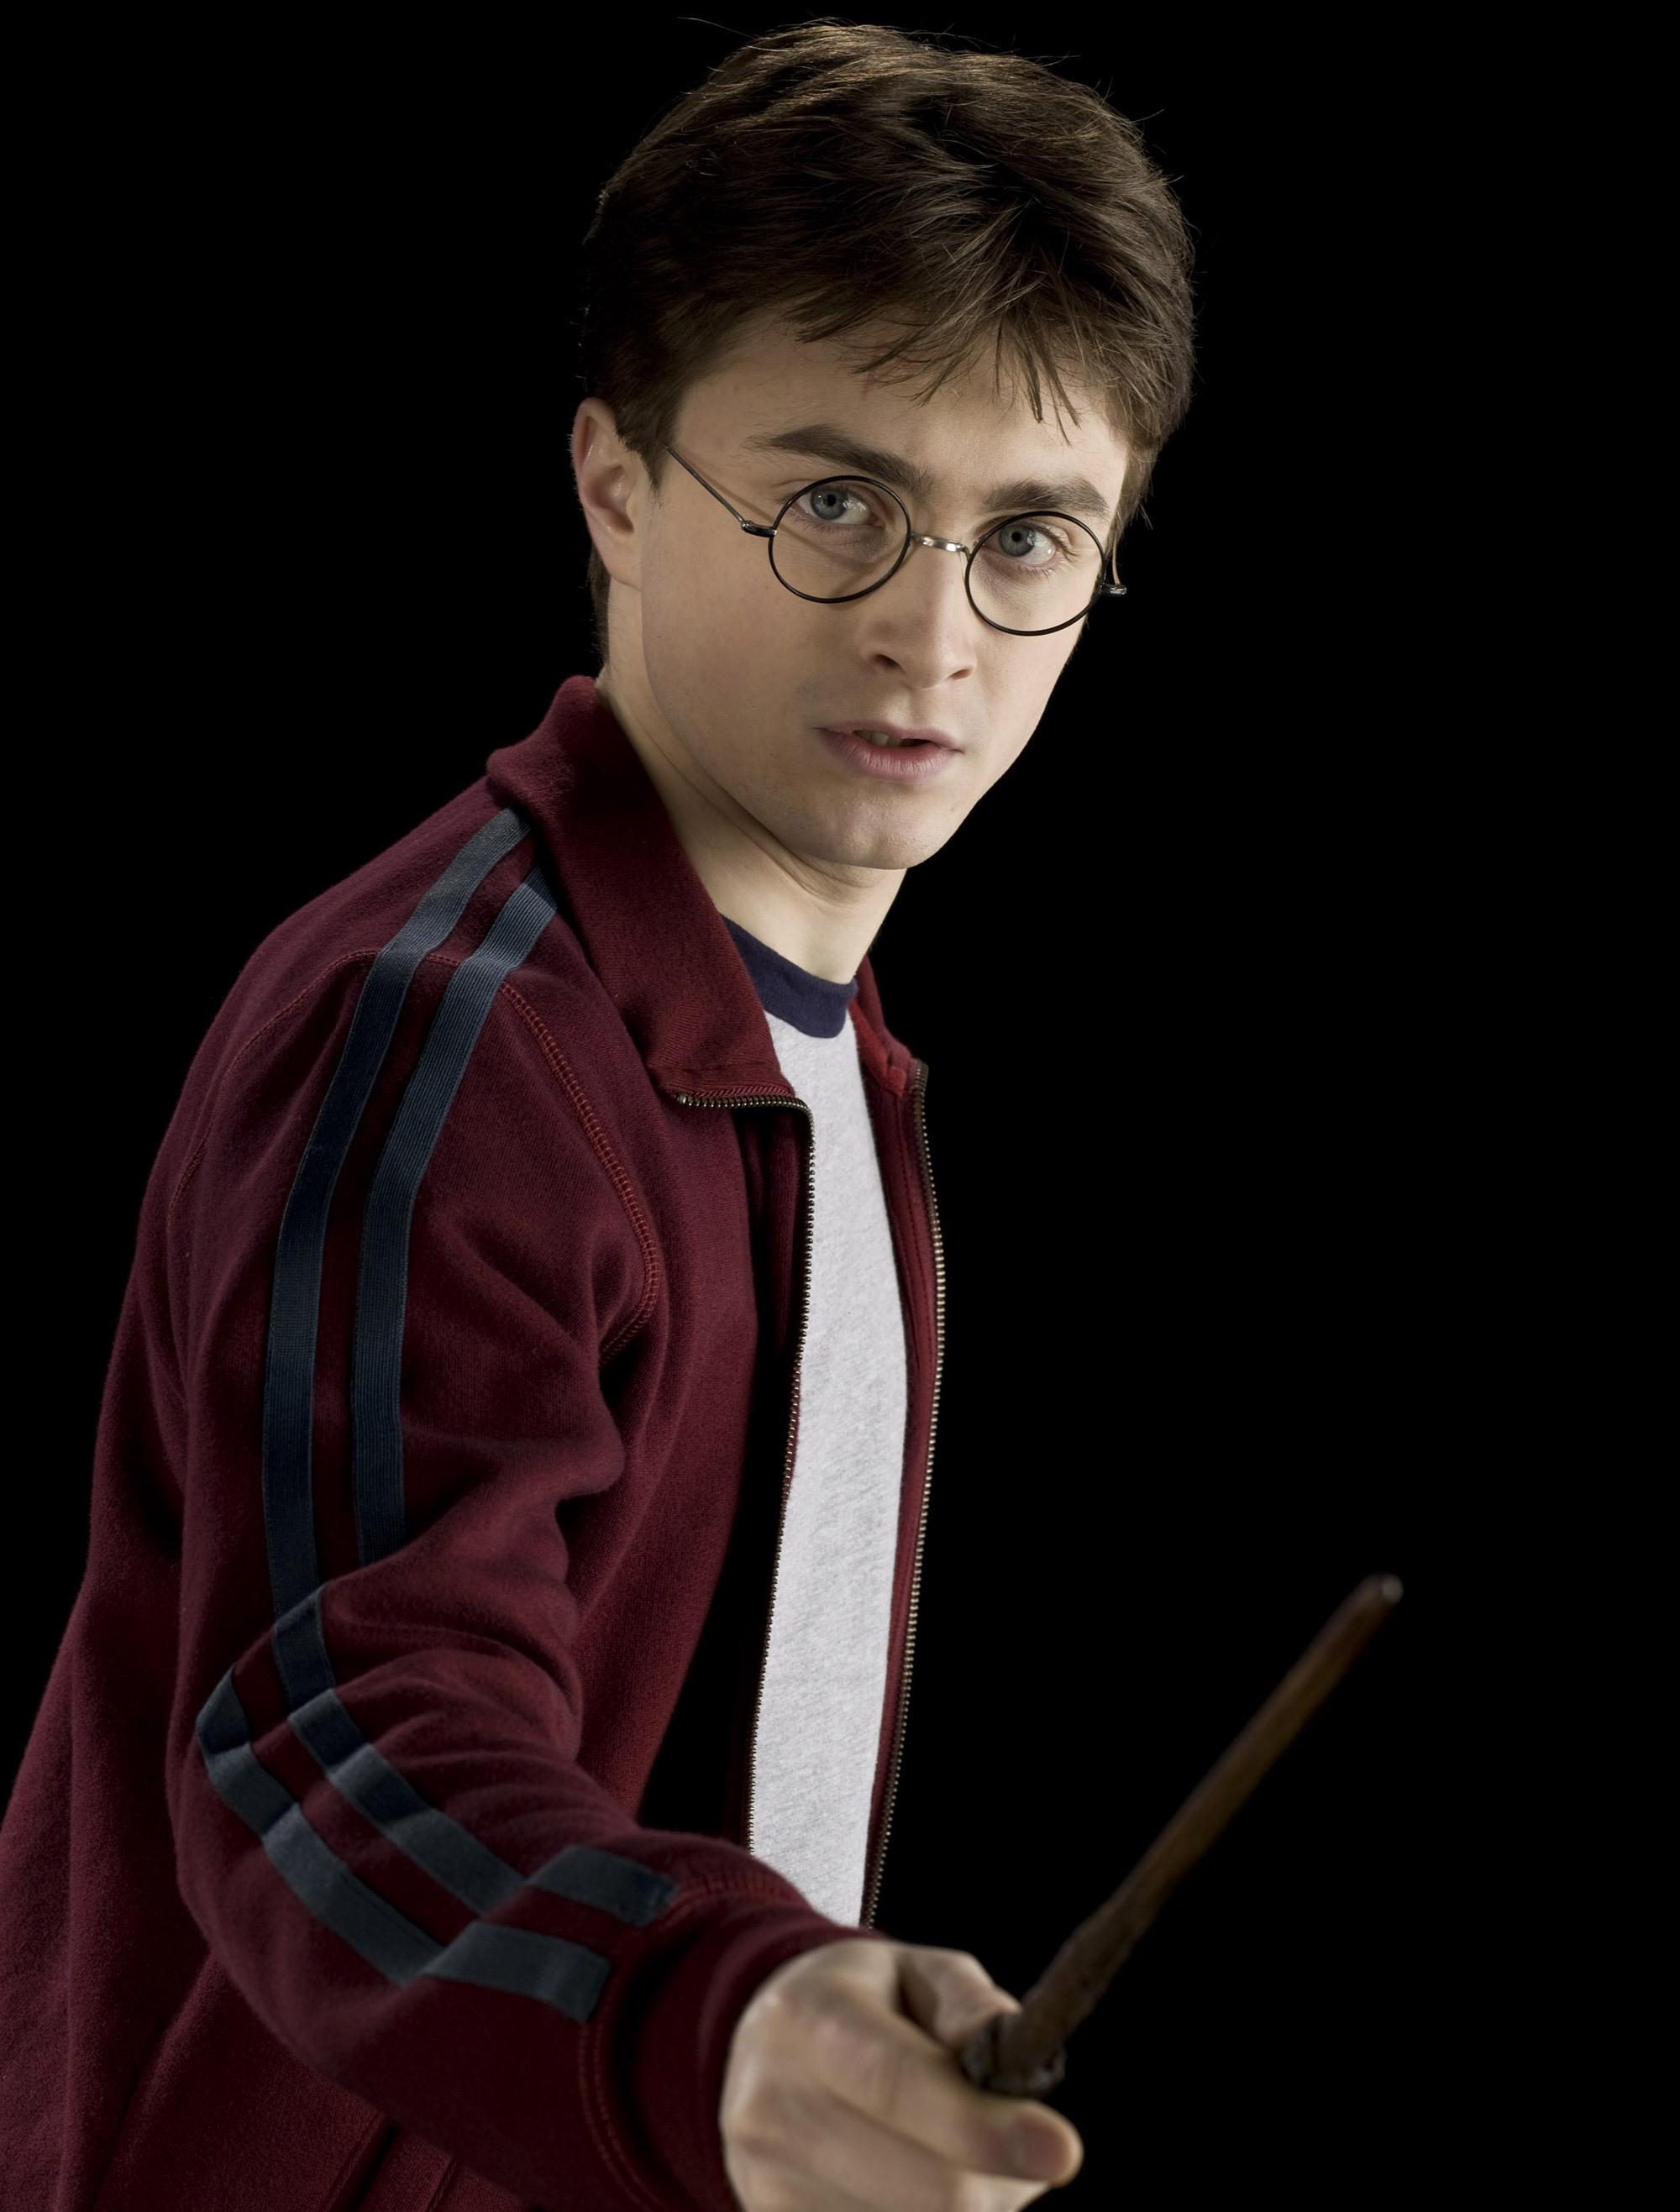 Harry_Potter_(HBP_promo)_1.jpg